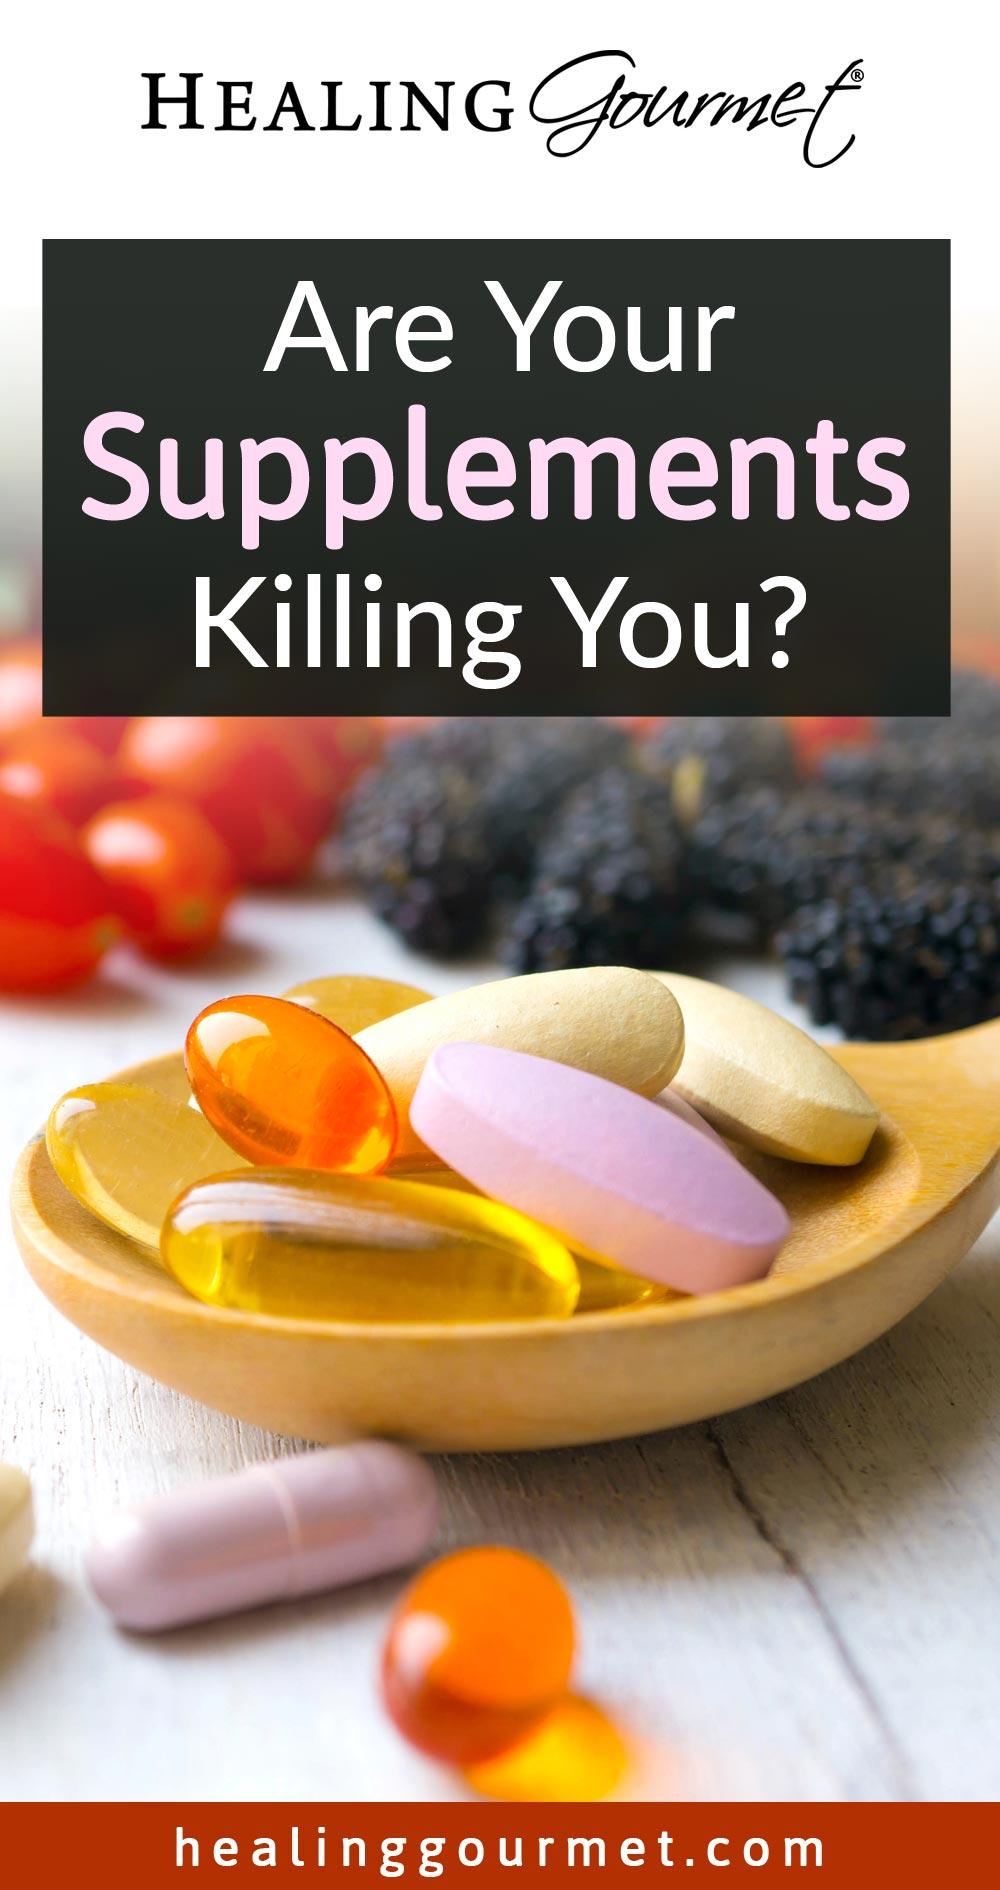 Are Antioxidants Really Killing People